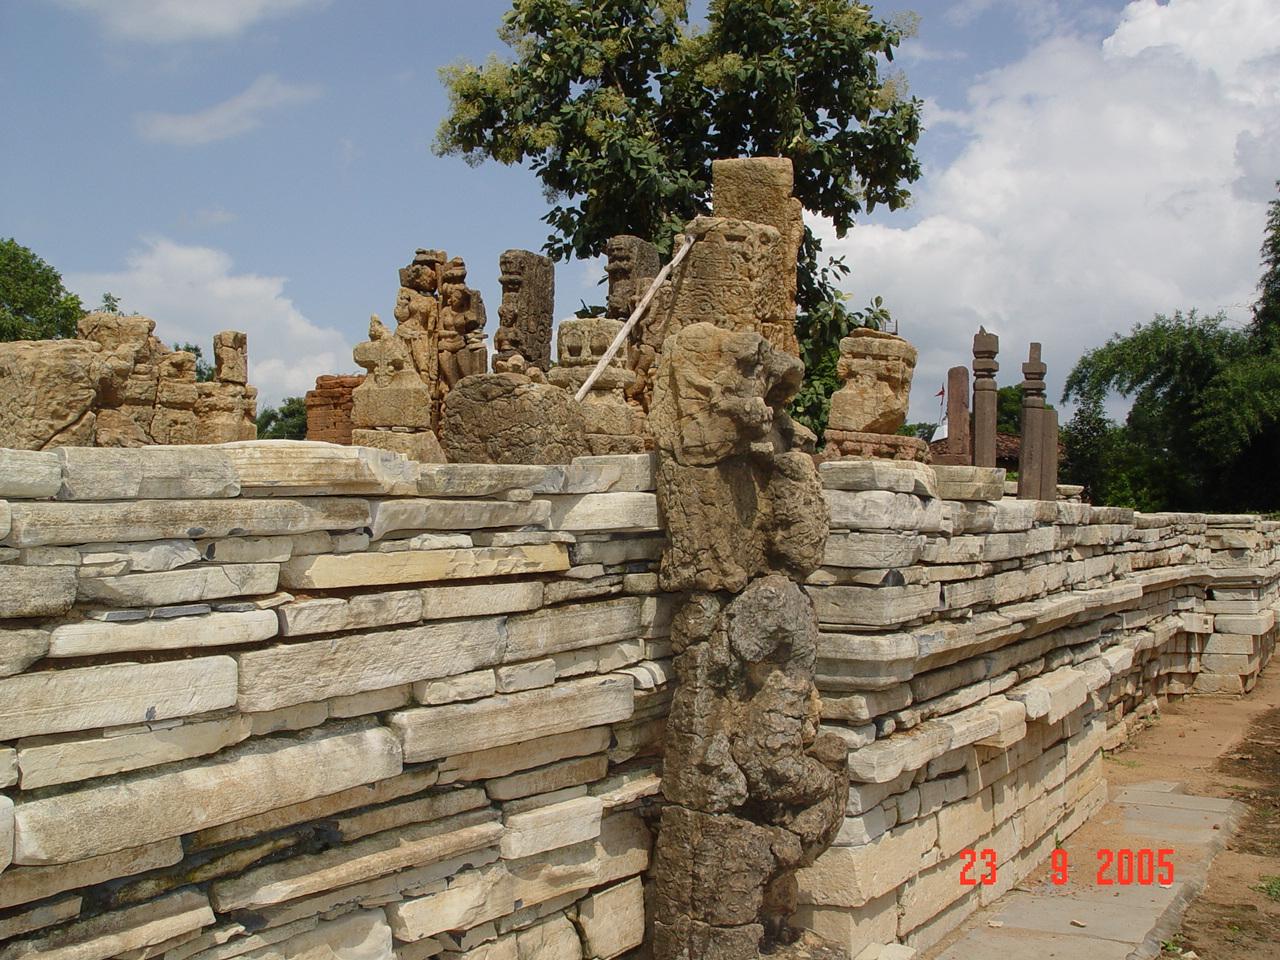 http://2.bp.blogspot.com/-SSzf8a6-3g8/Tih62vzR2JI/AAAAAAAABhM/X5Xnv-t8kWA/s1600/5th+C+Shiv+temple%2C+Sirpur+ruins.JPG